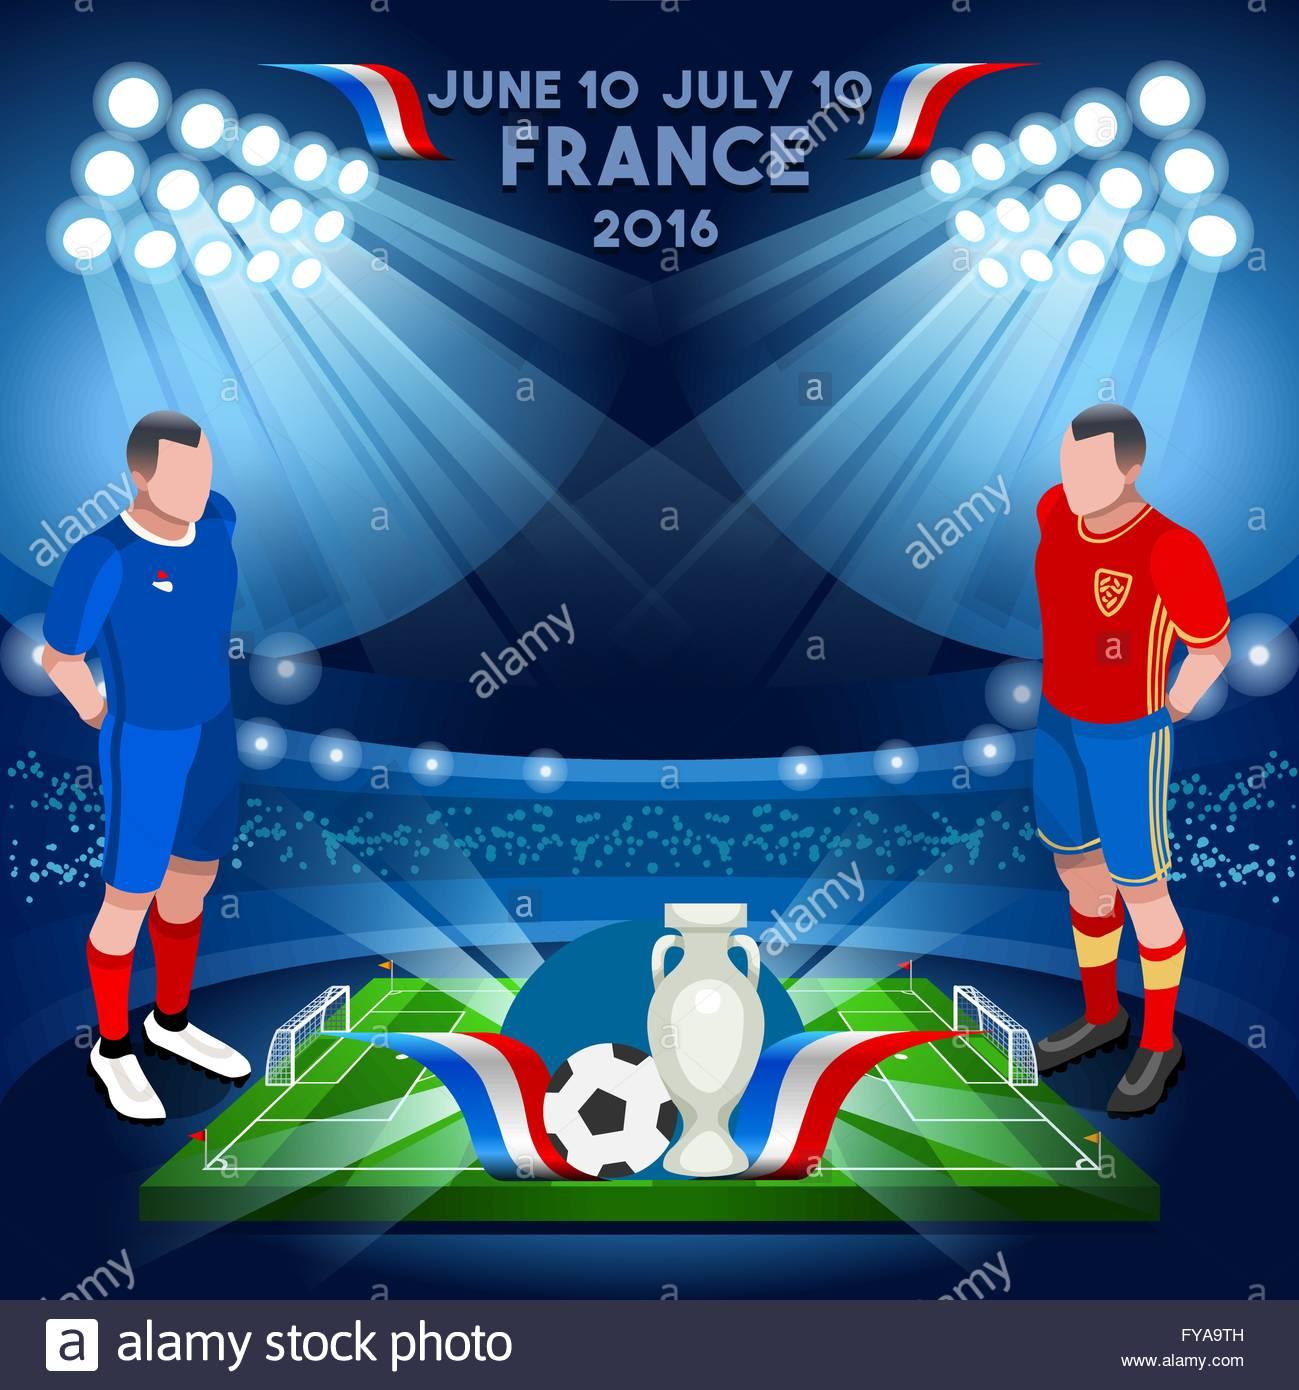 UEFA EURO 2016 - UEFA.com